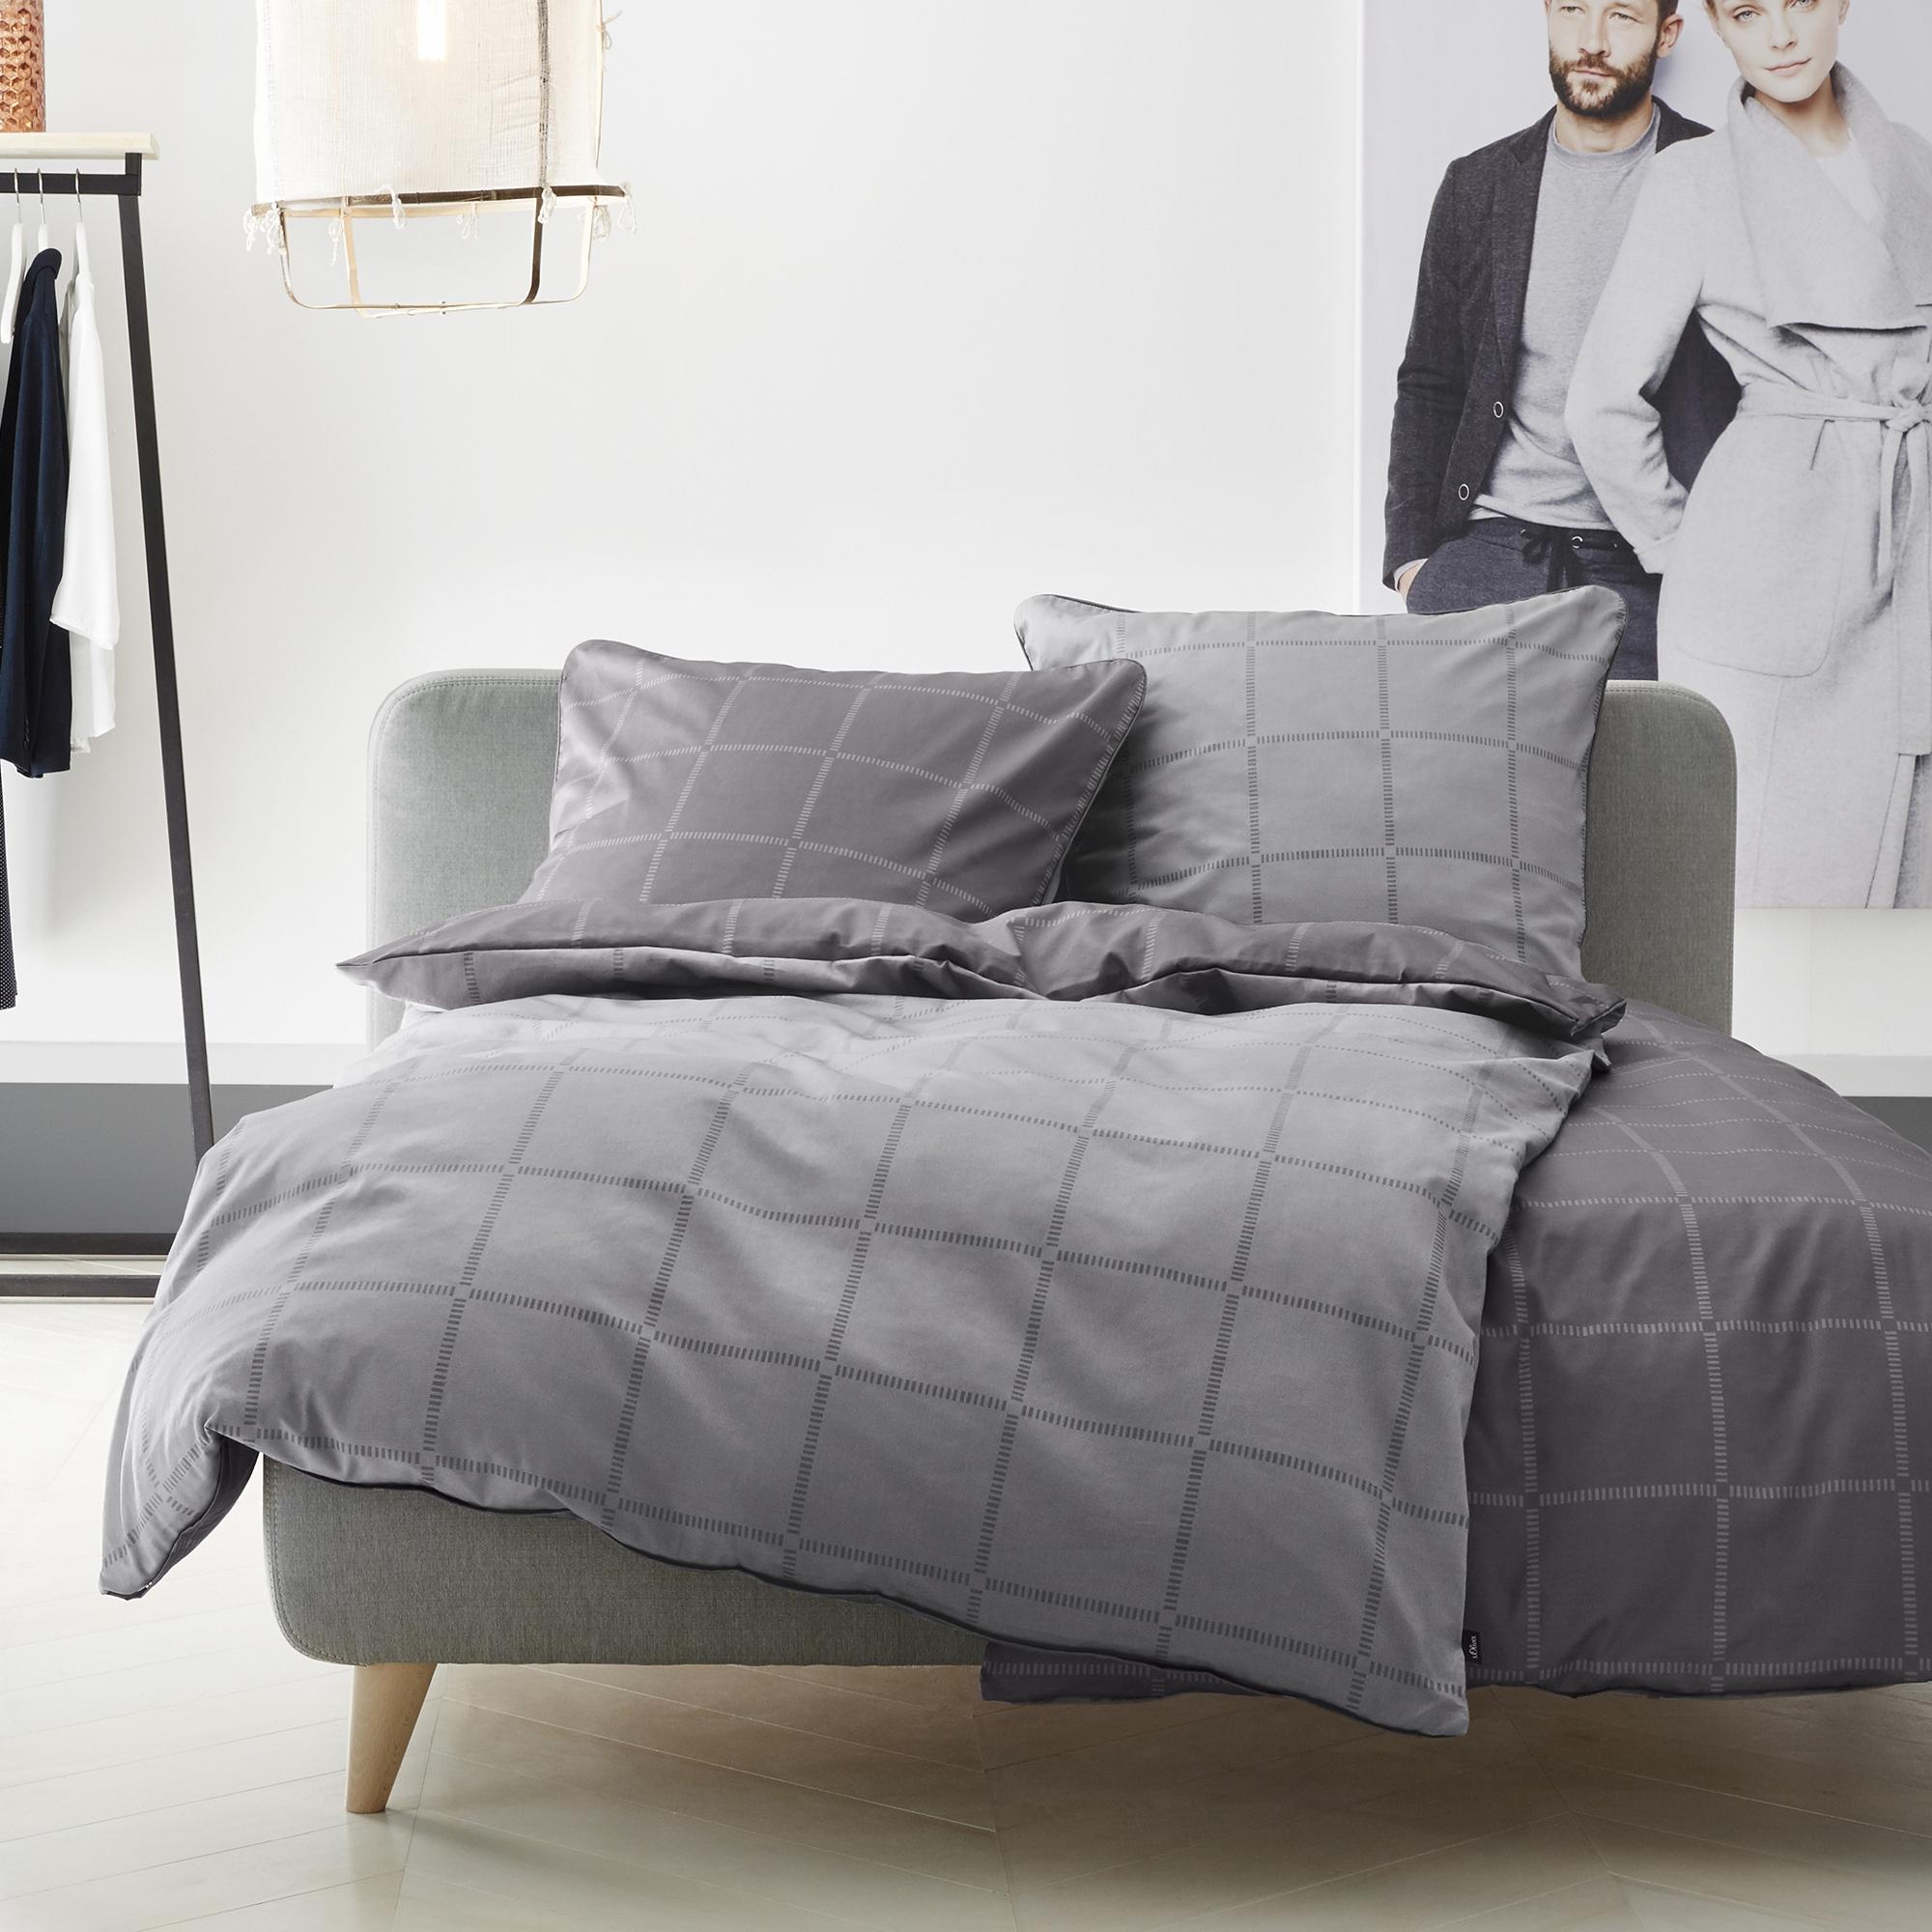 satinbettw sche s oliver ibena online shop. Black Bedroom Furniture Sets. Home Design Ideas